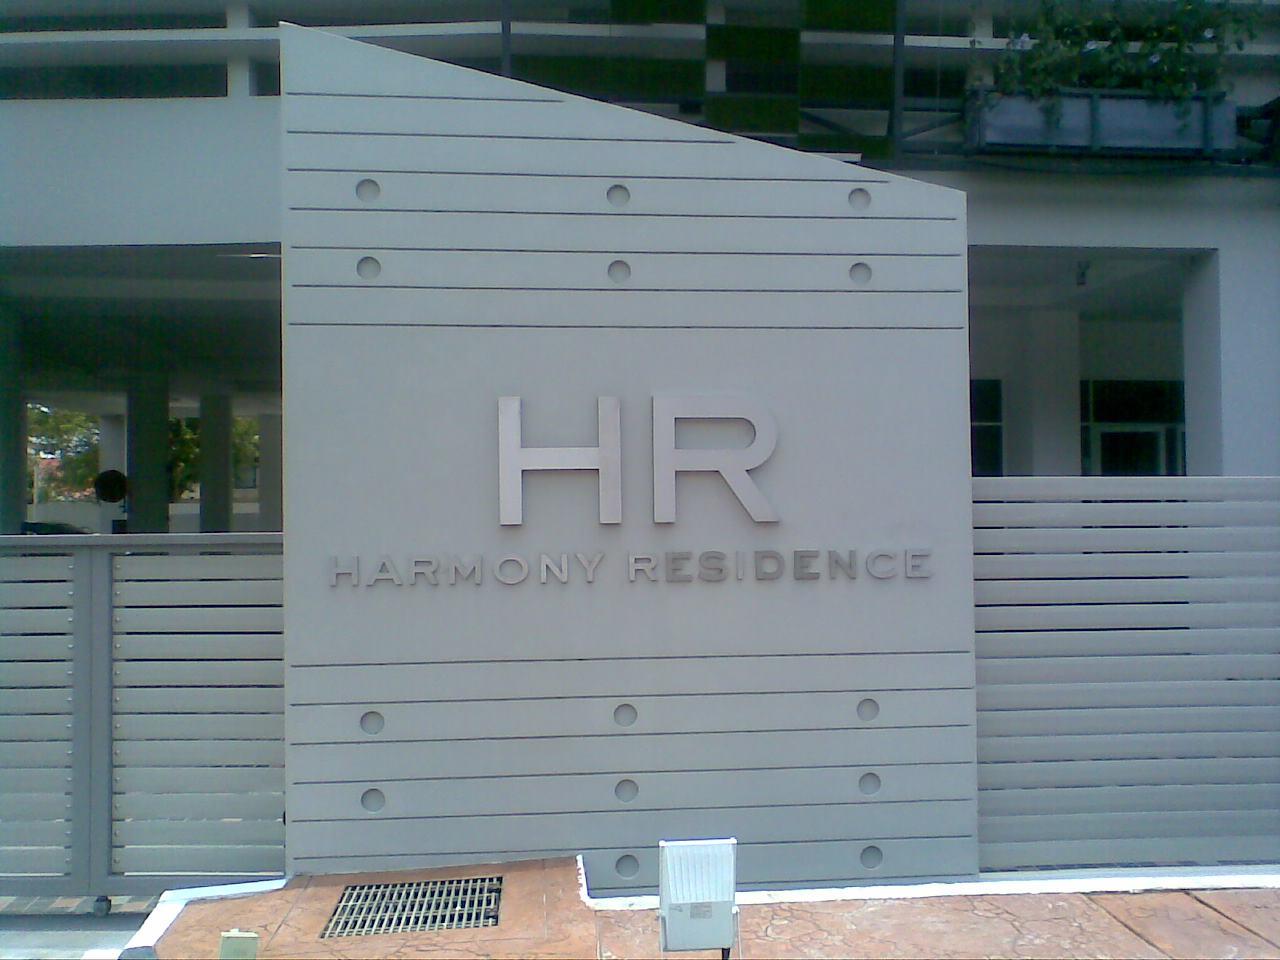 Harmony Residence, Tanjung Bungah